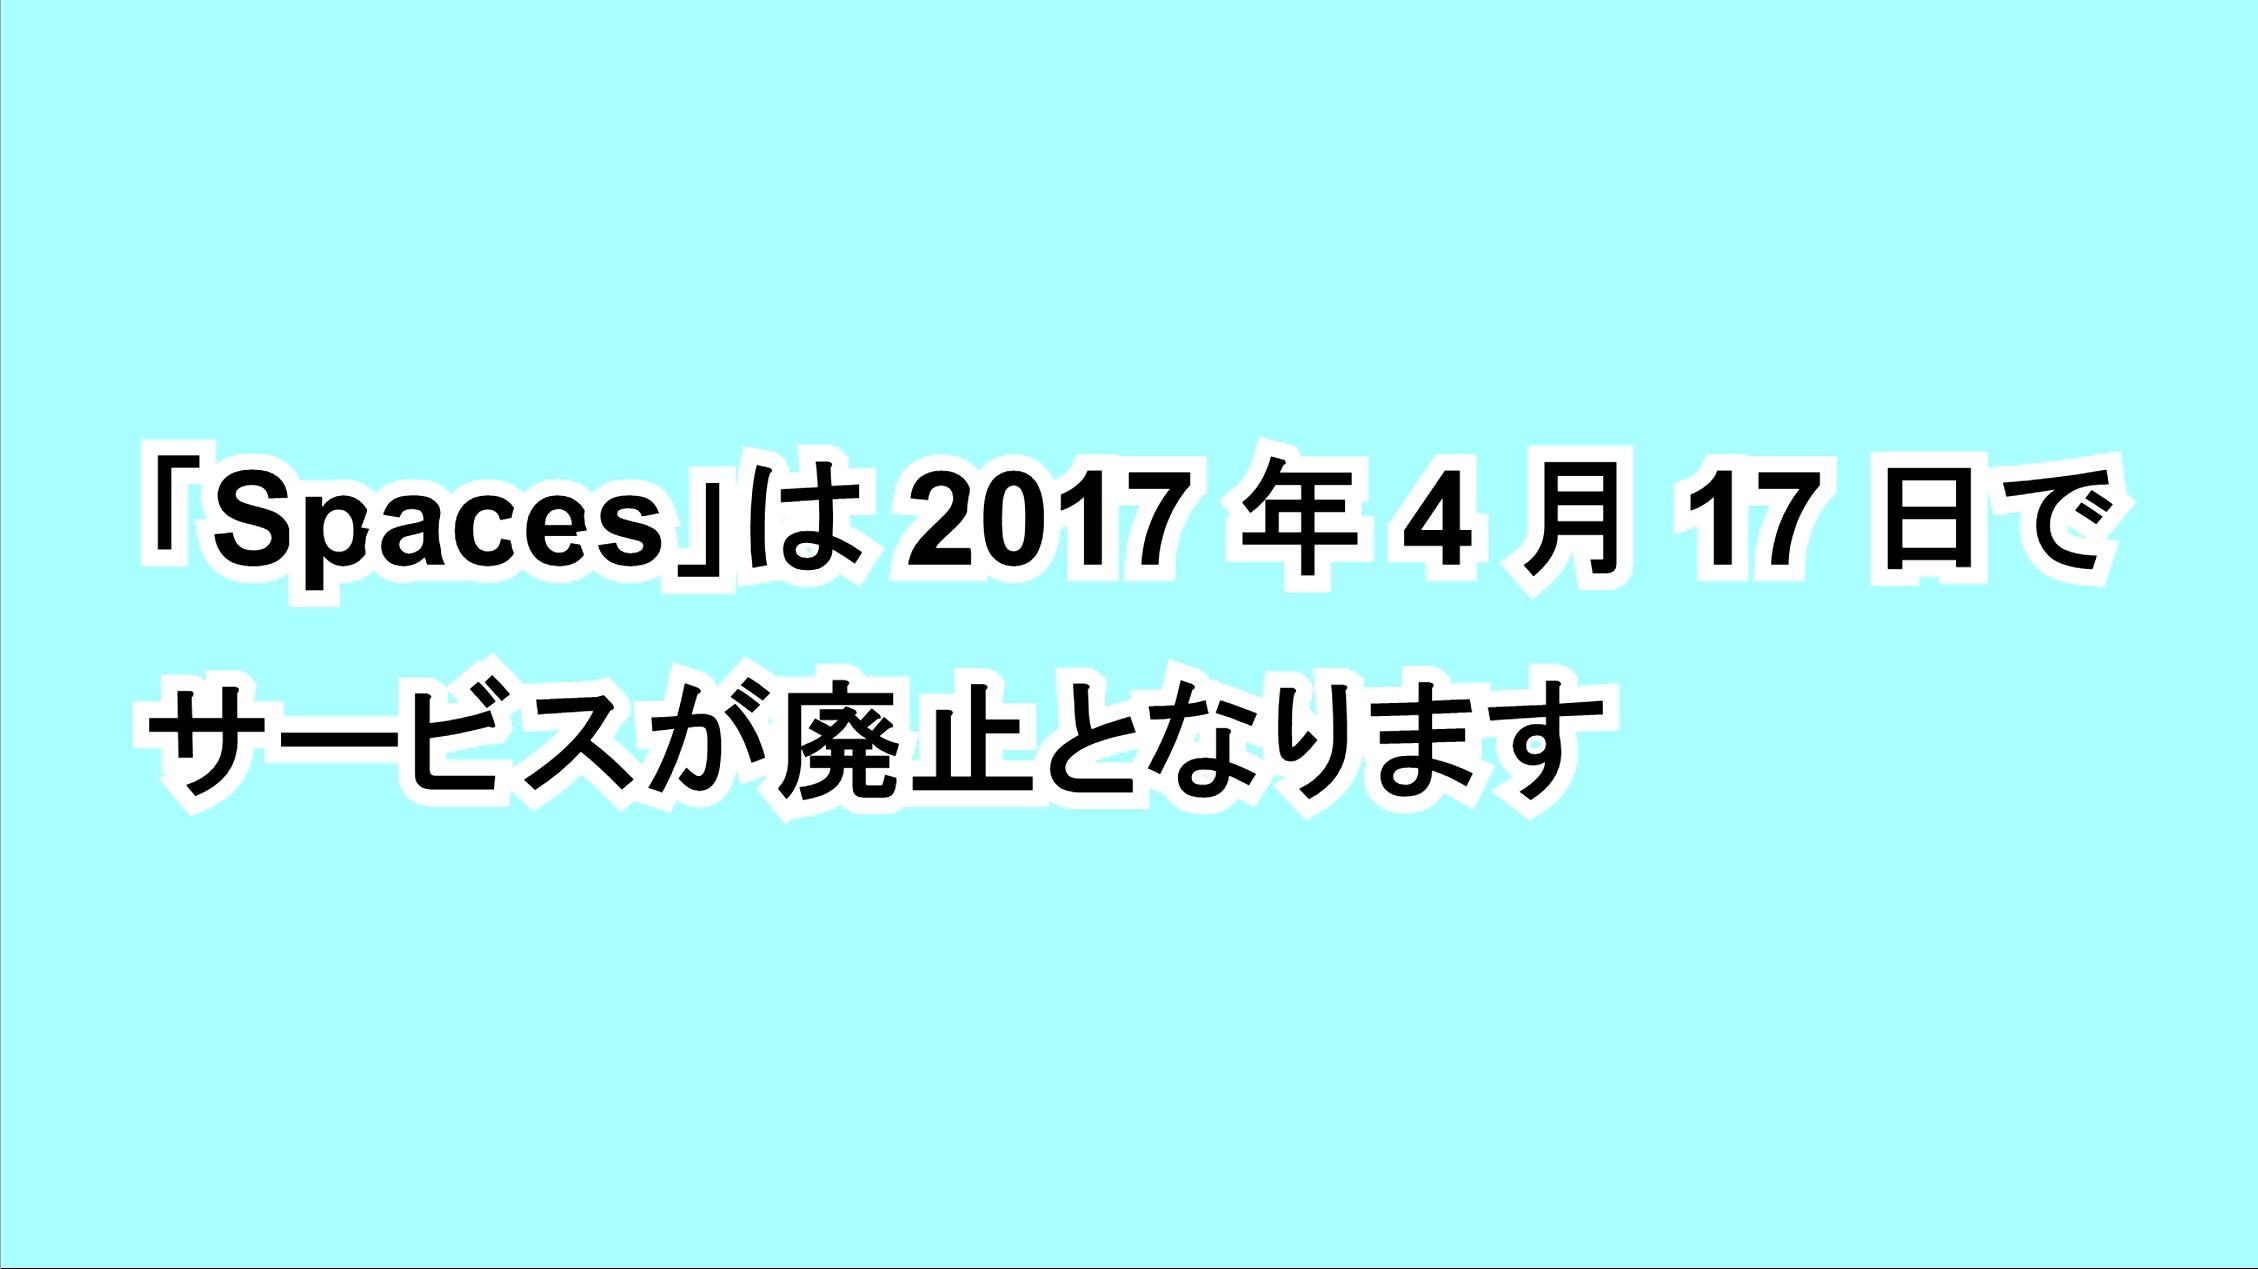 「Spaces」は2017年4 月17日でサービスが廃止となります